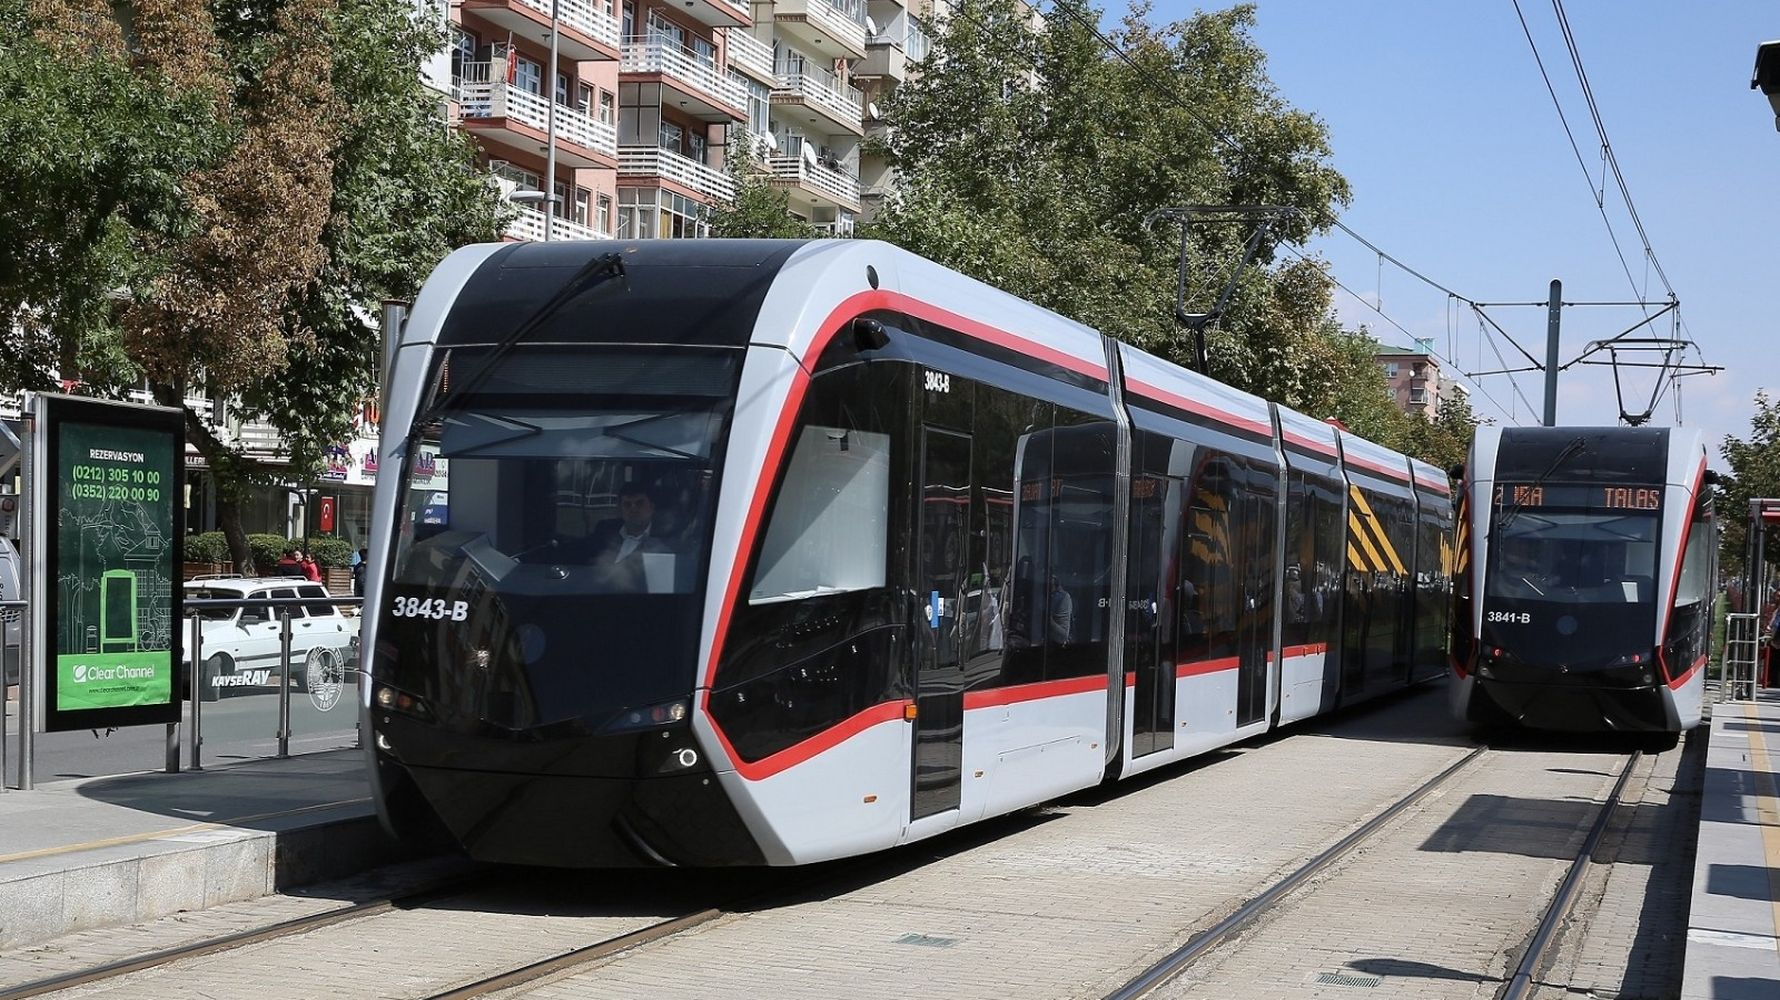 kayseri rail system guzergahi armin entrust to electric